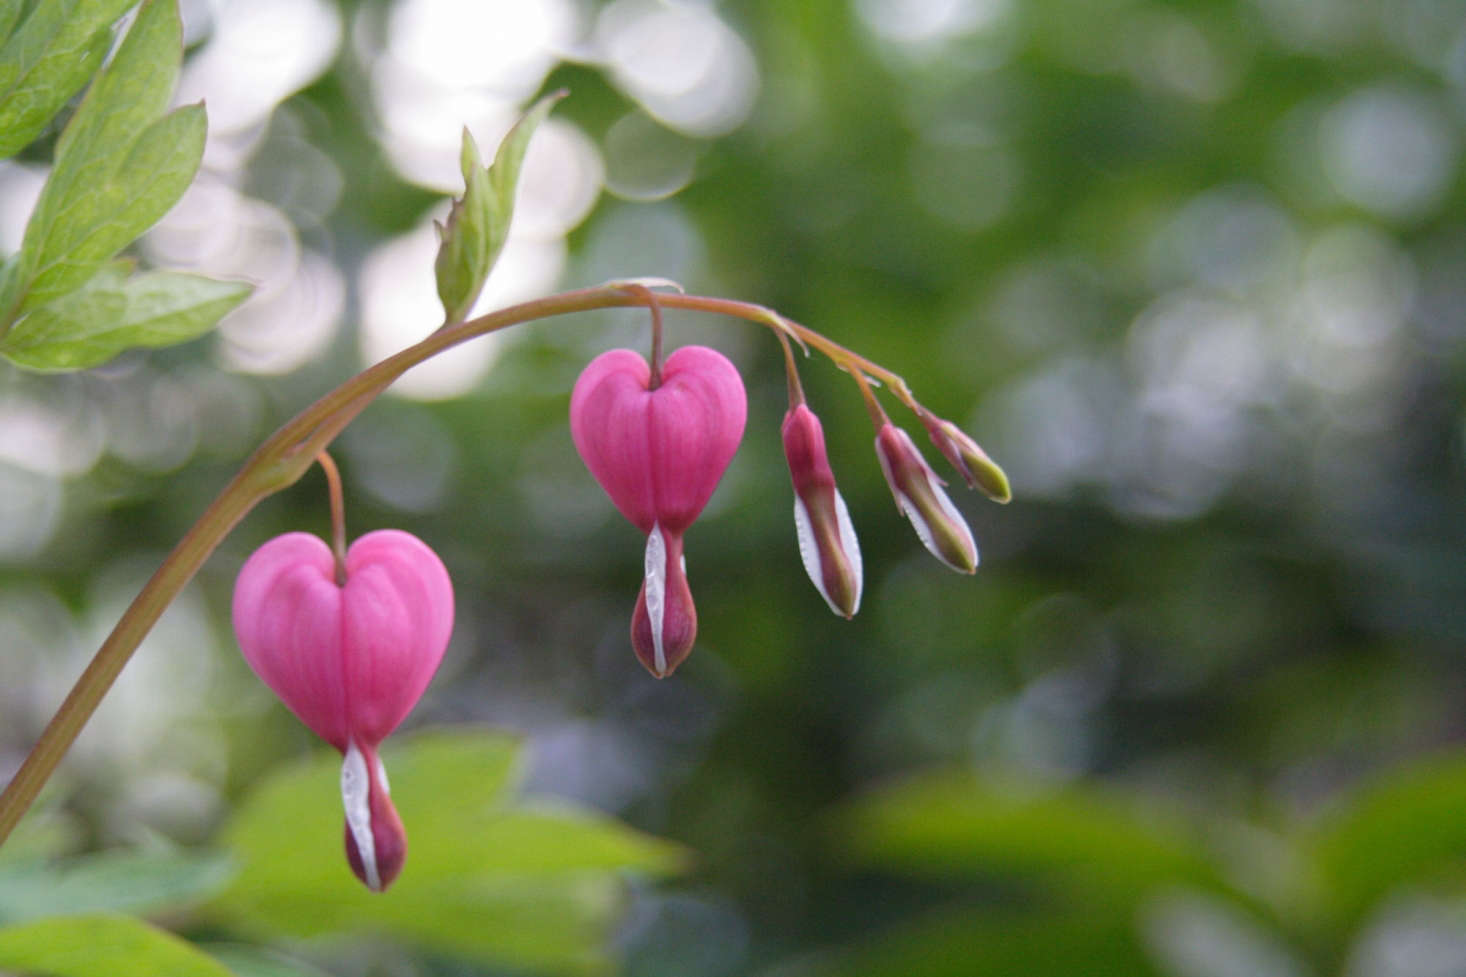 Dicentra spectabilis bleeding heart by K Yamad Flickr